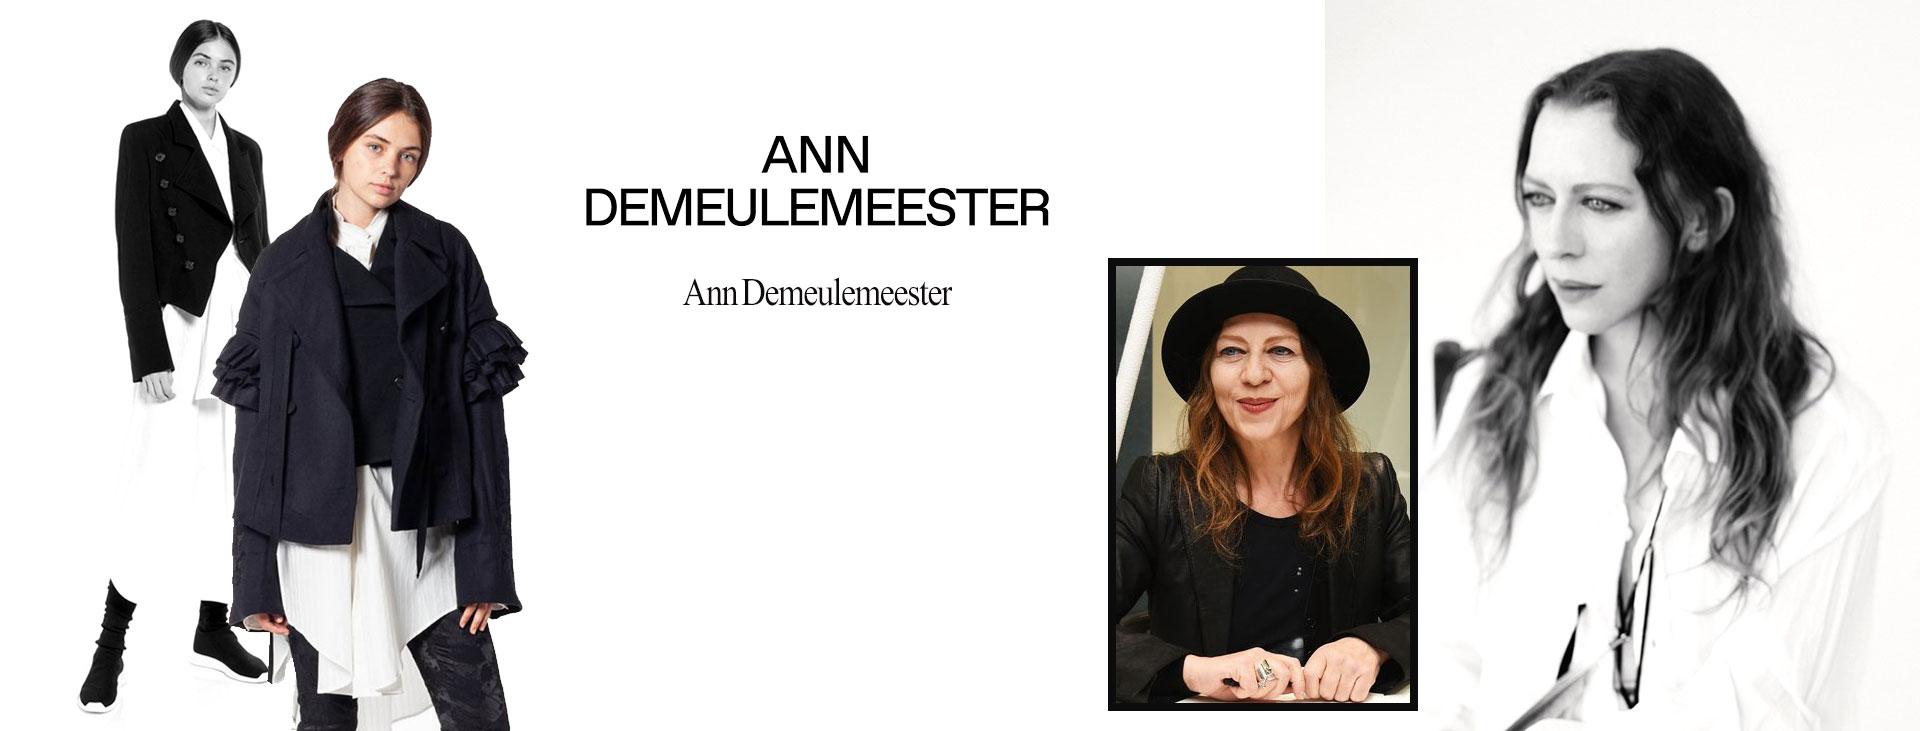 Ann Demeulemeester2 - زنان پیشگام در صنعت مد